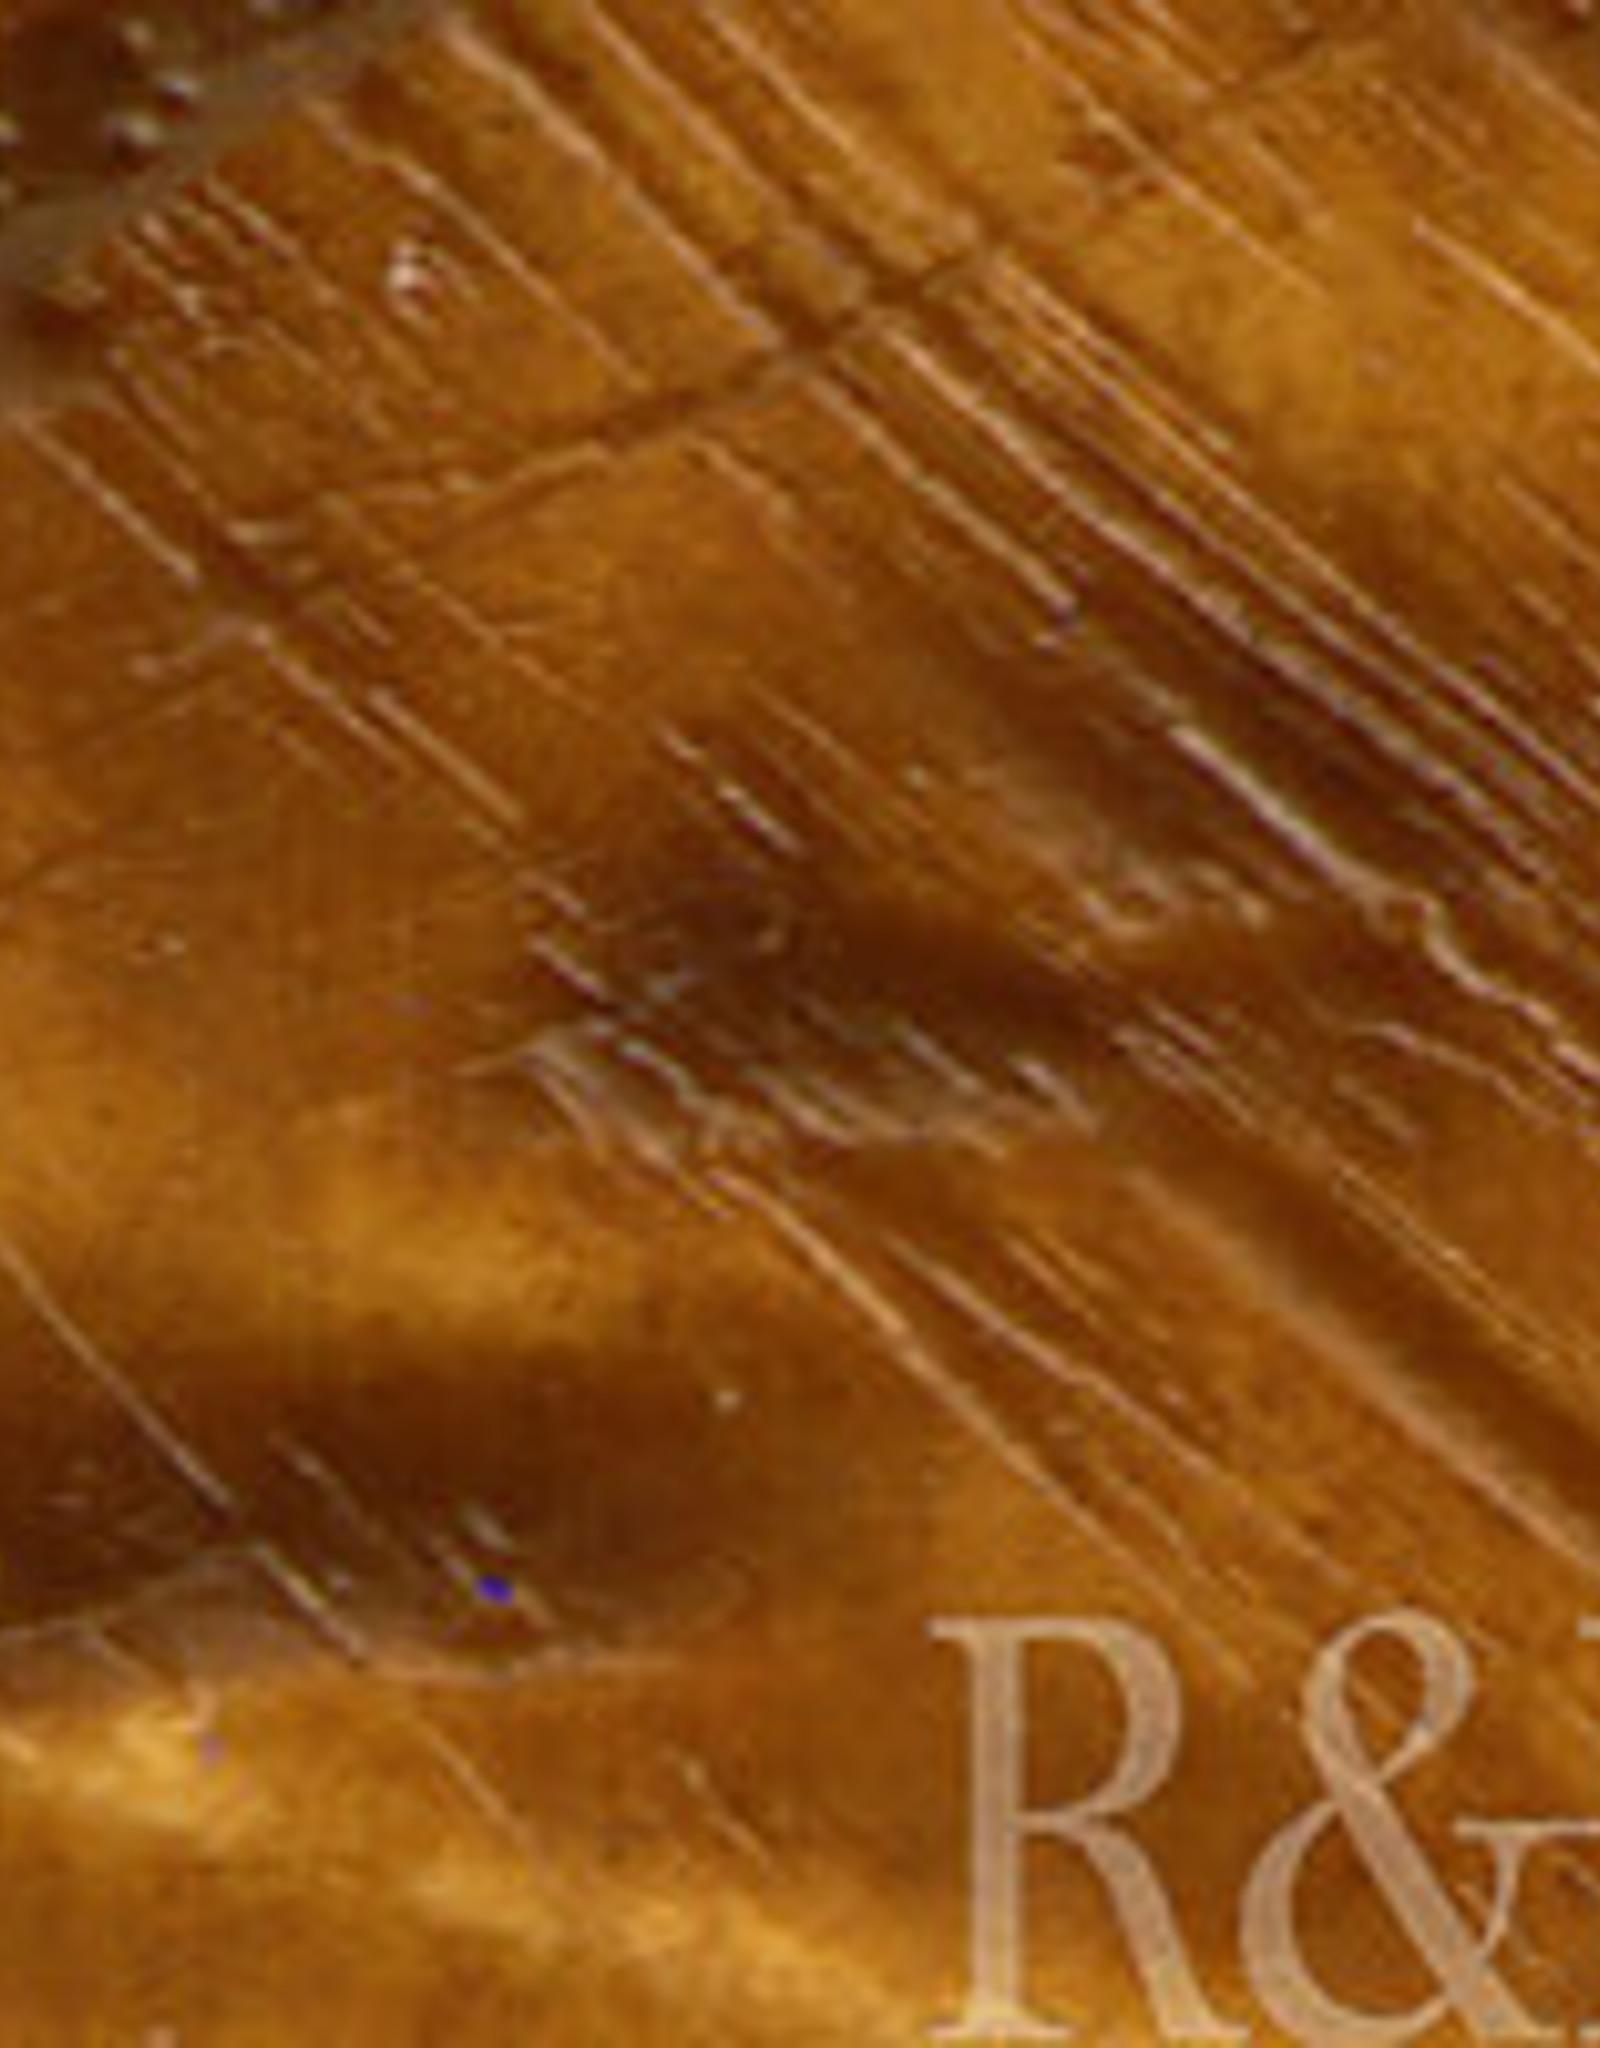 R&F Handmade Paints Encaustic Pigment Stick Raw Sienna